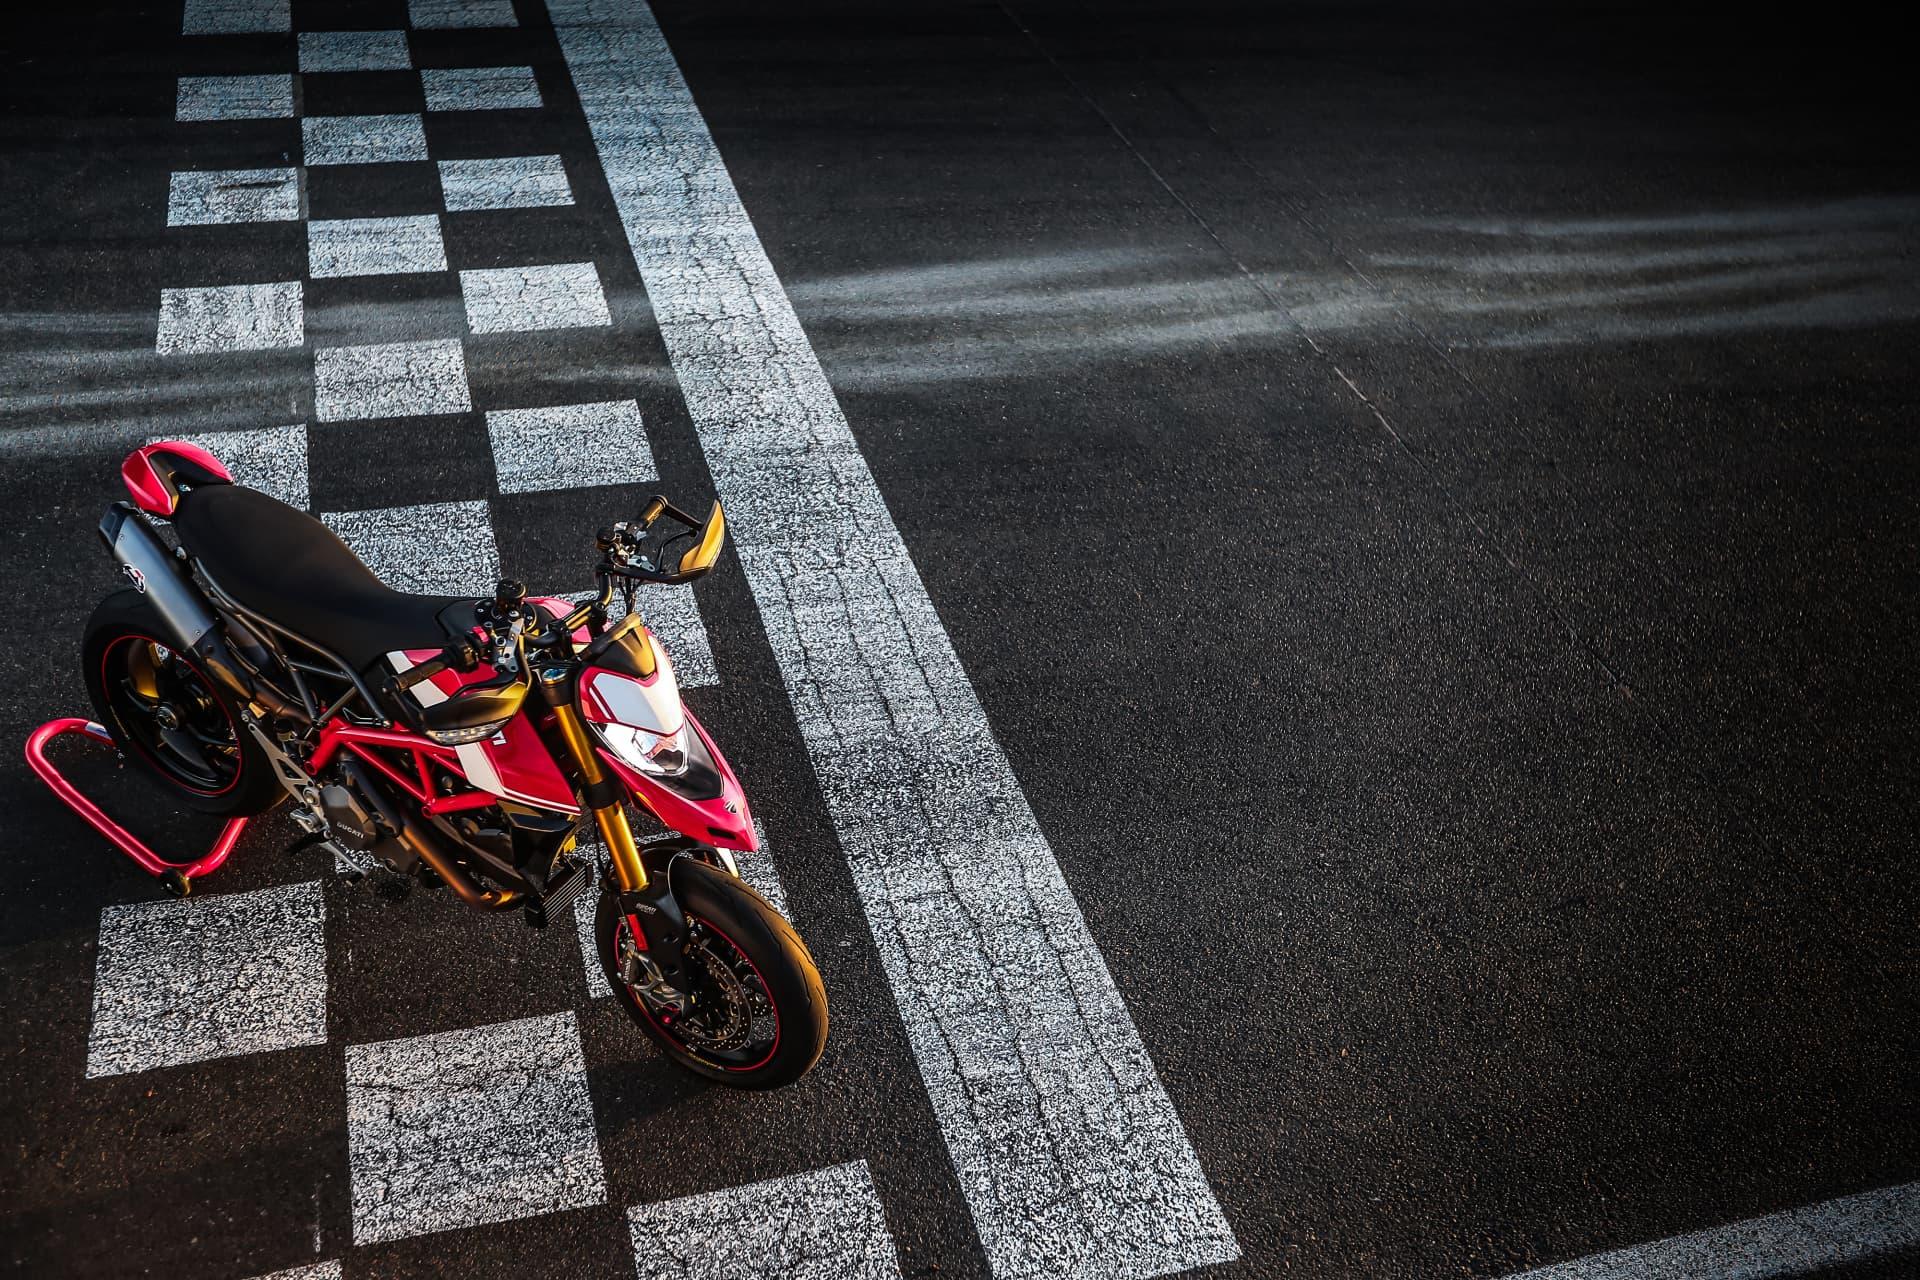 Ducati Hypermotard 950 Sp Static 02 Uc70303 Mid